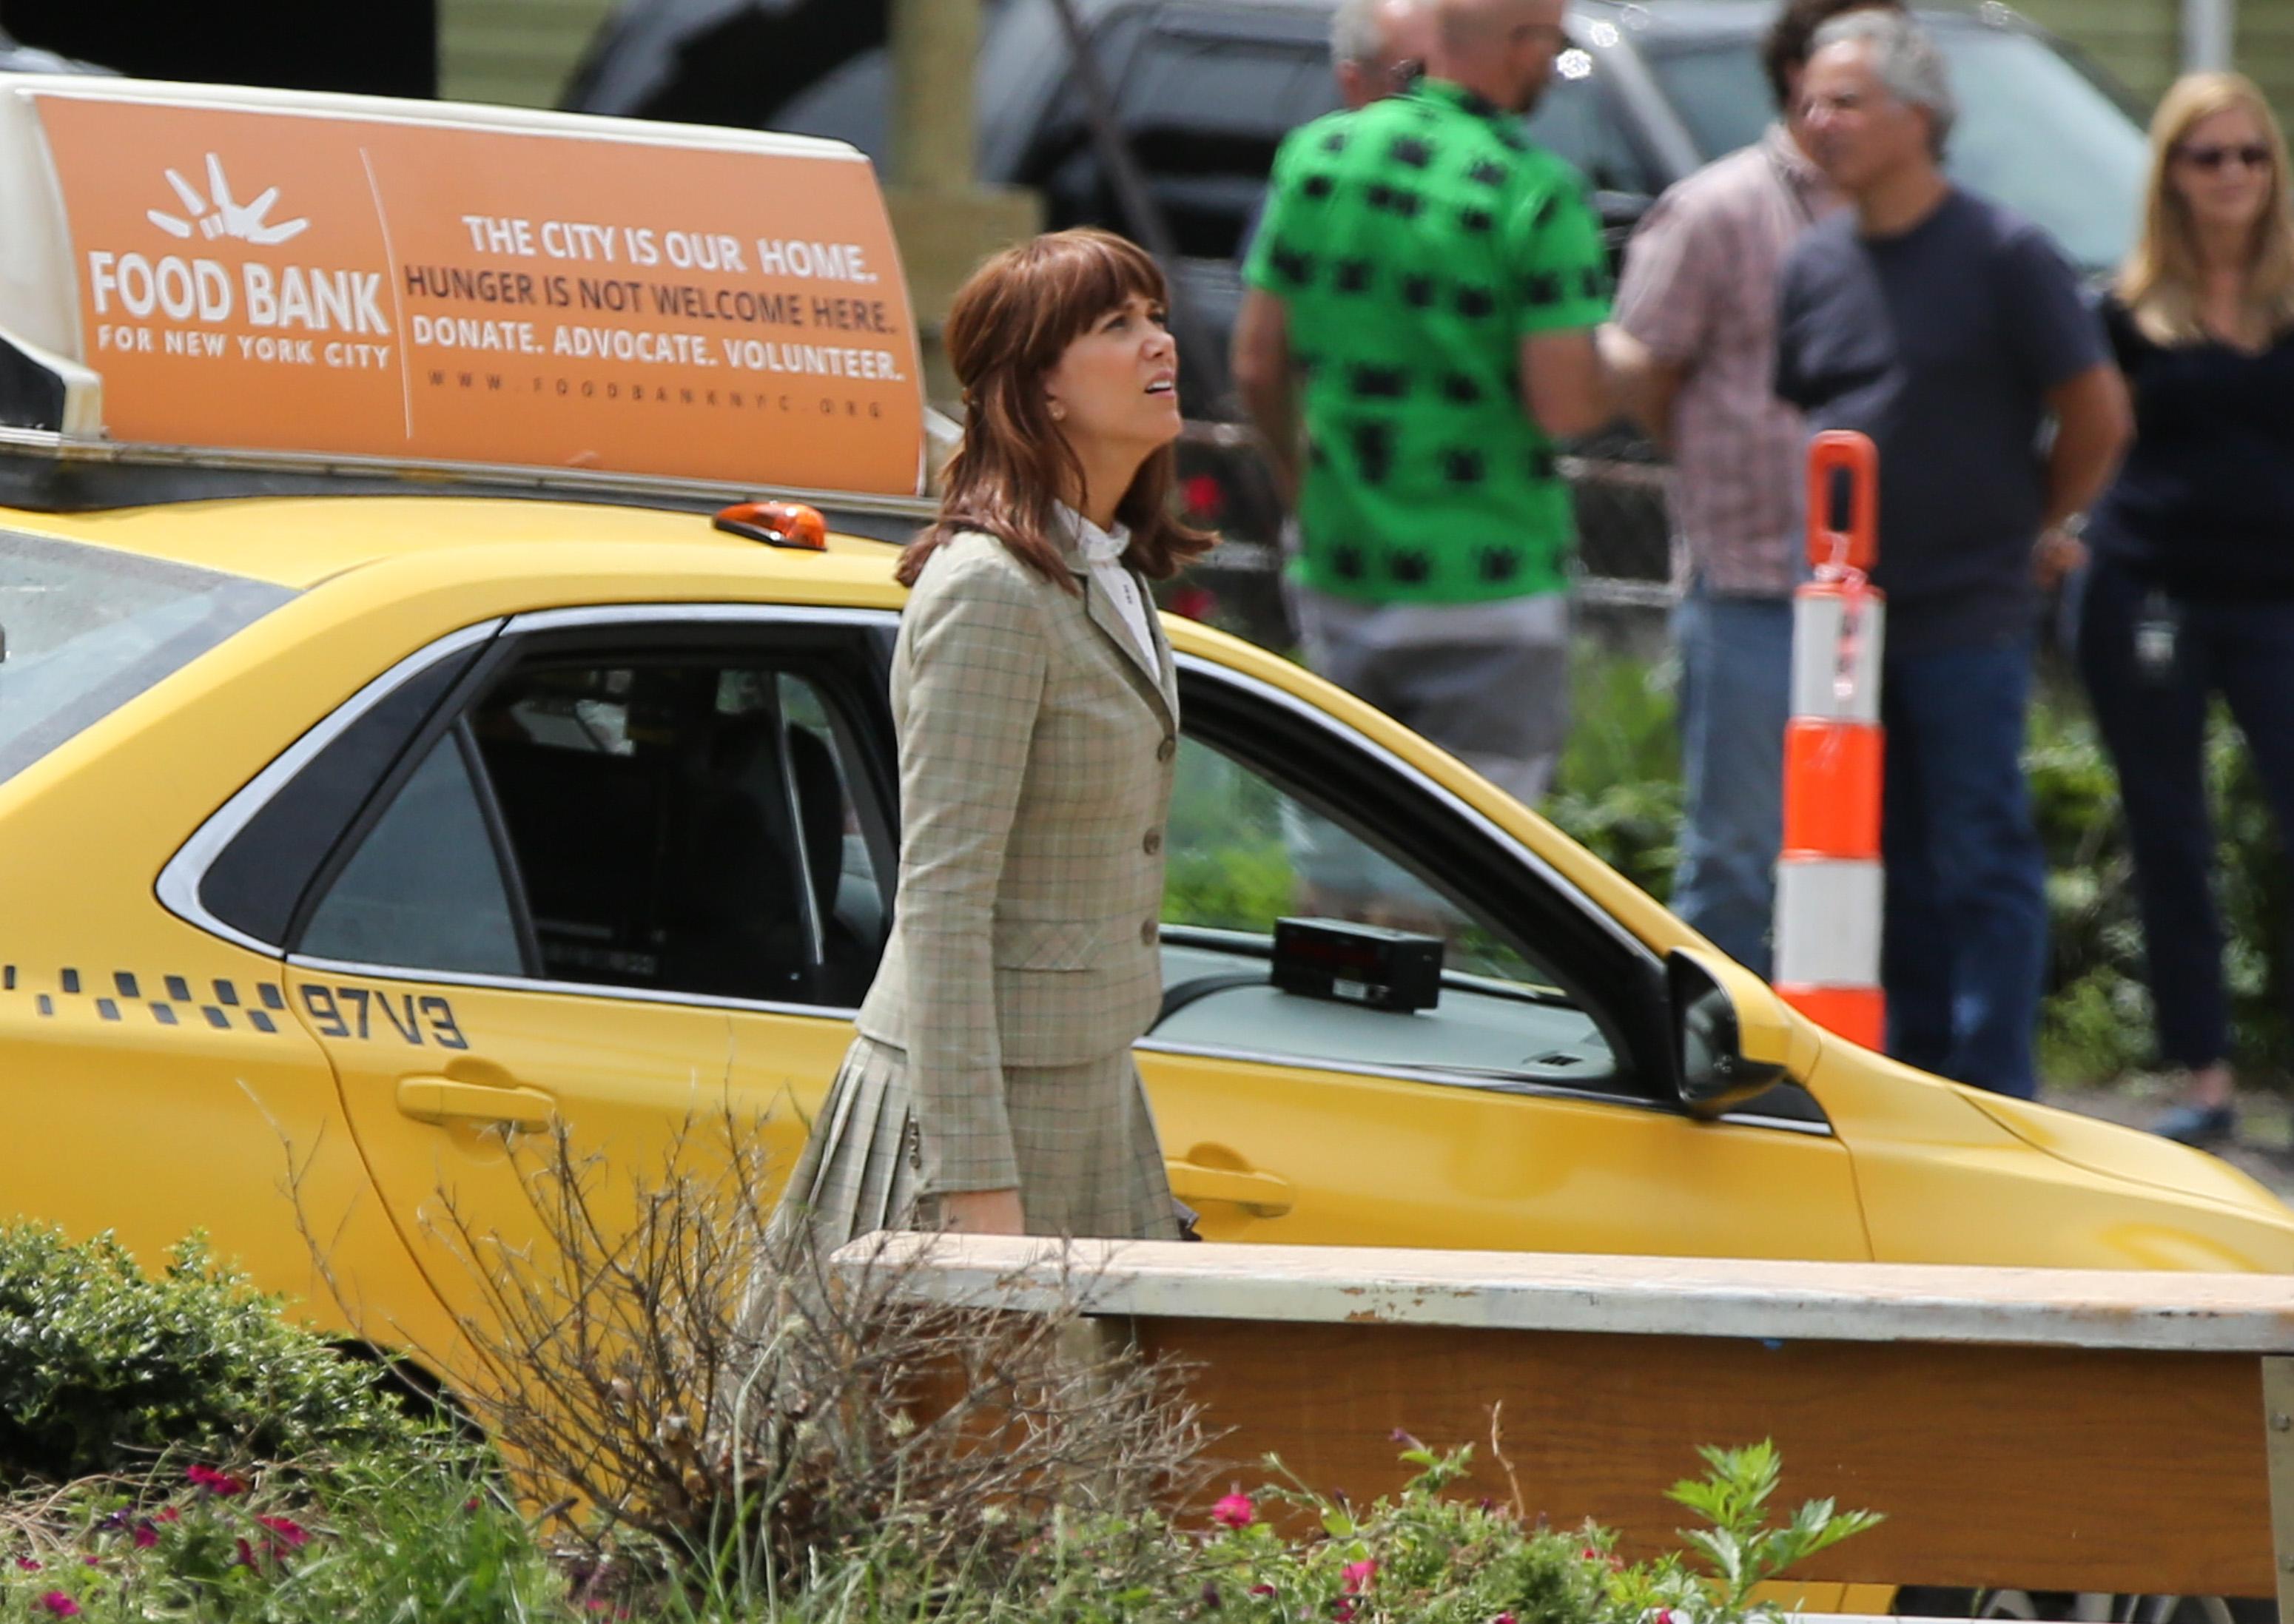 Kristen Wiig is seen on the set of 'Ghostbuster' in Boston on June 18, 2015 in Boston, Massachusetts.